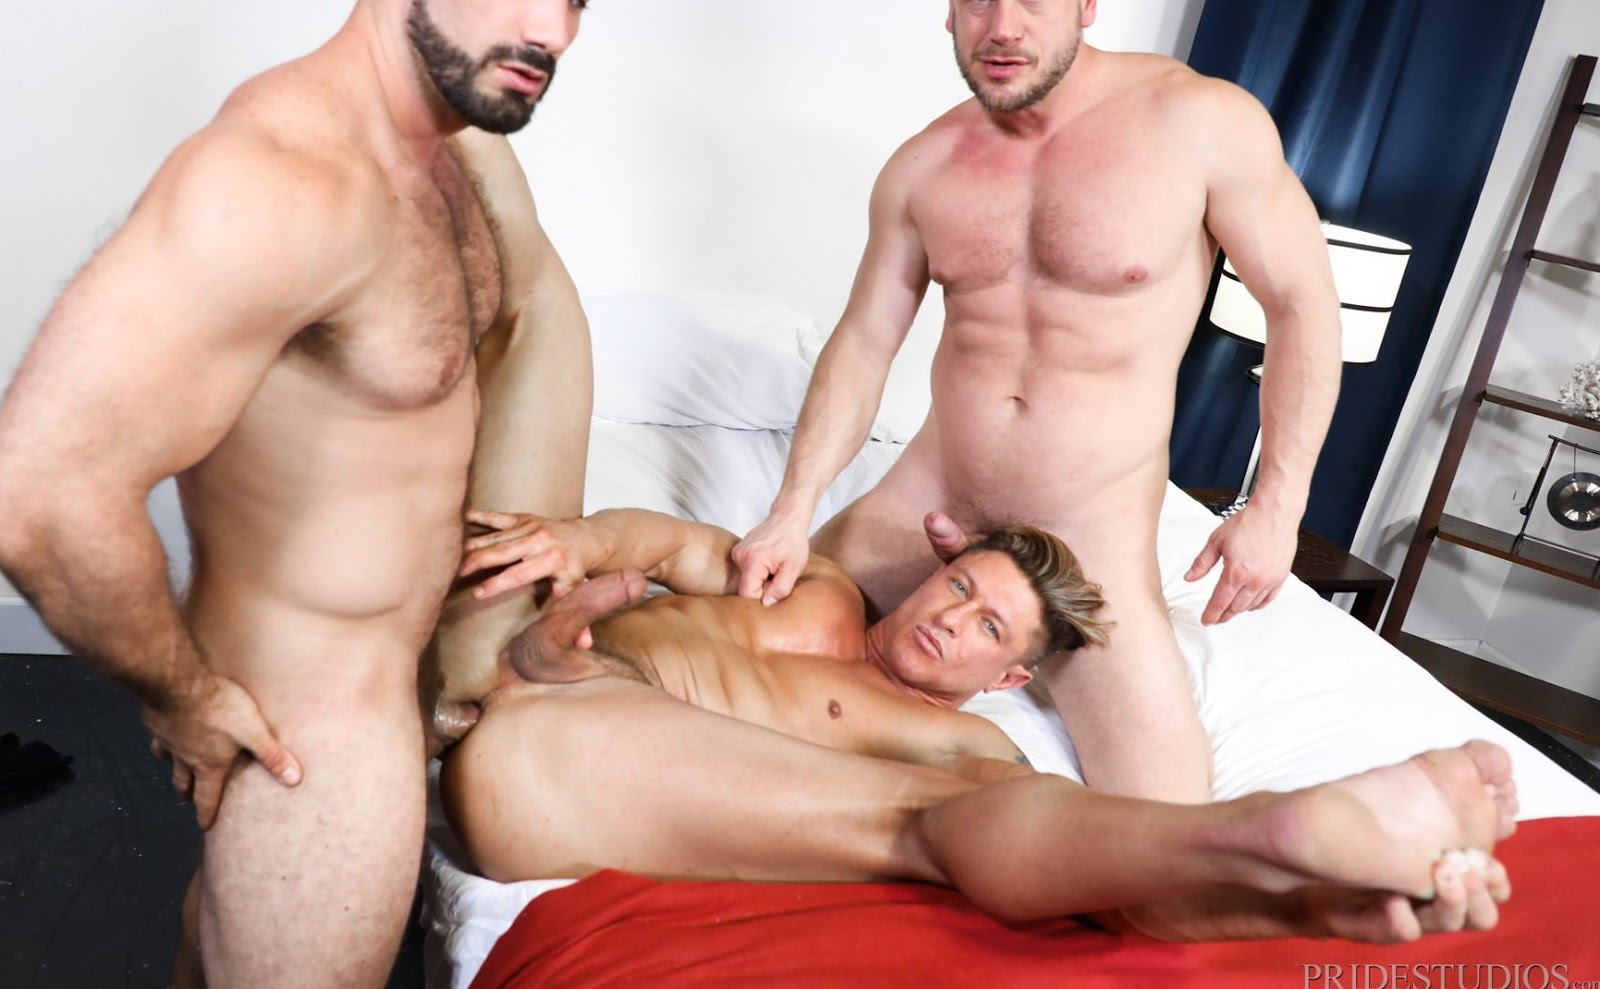 Actor Porno Gay Bryce Evans porn star mugshots!   18+     nsfw  : bryce evans